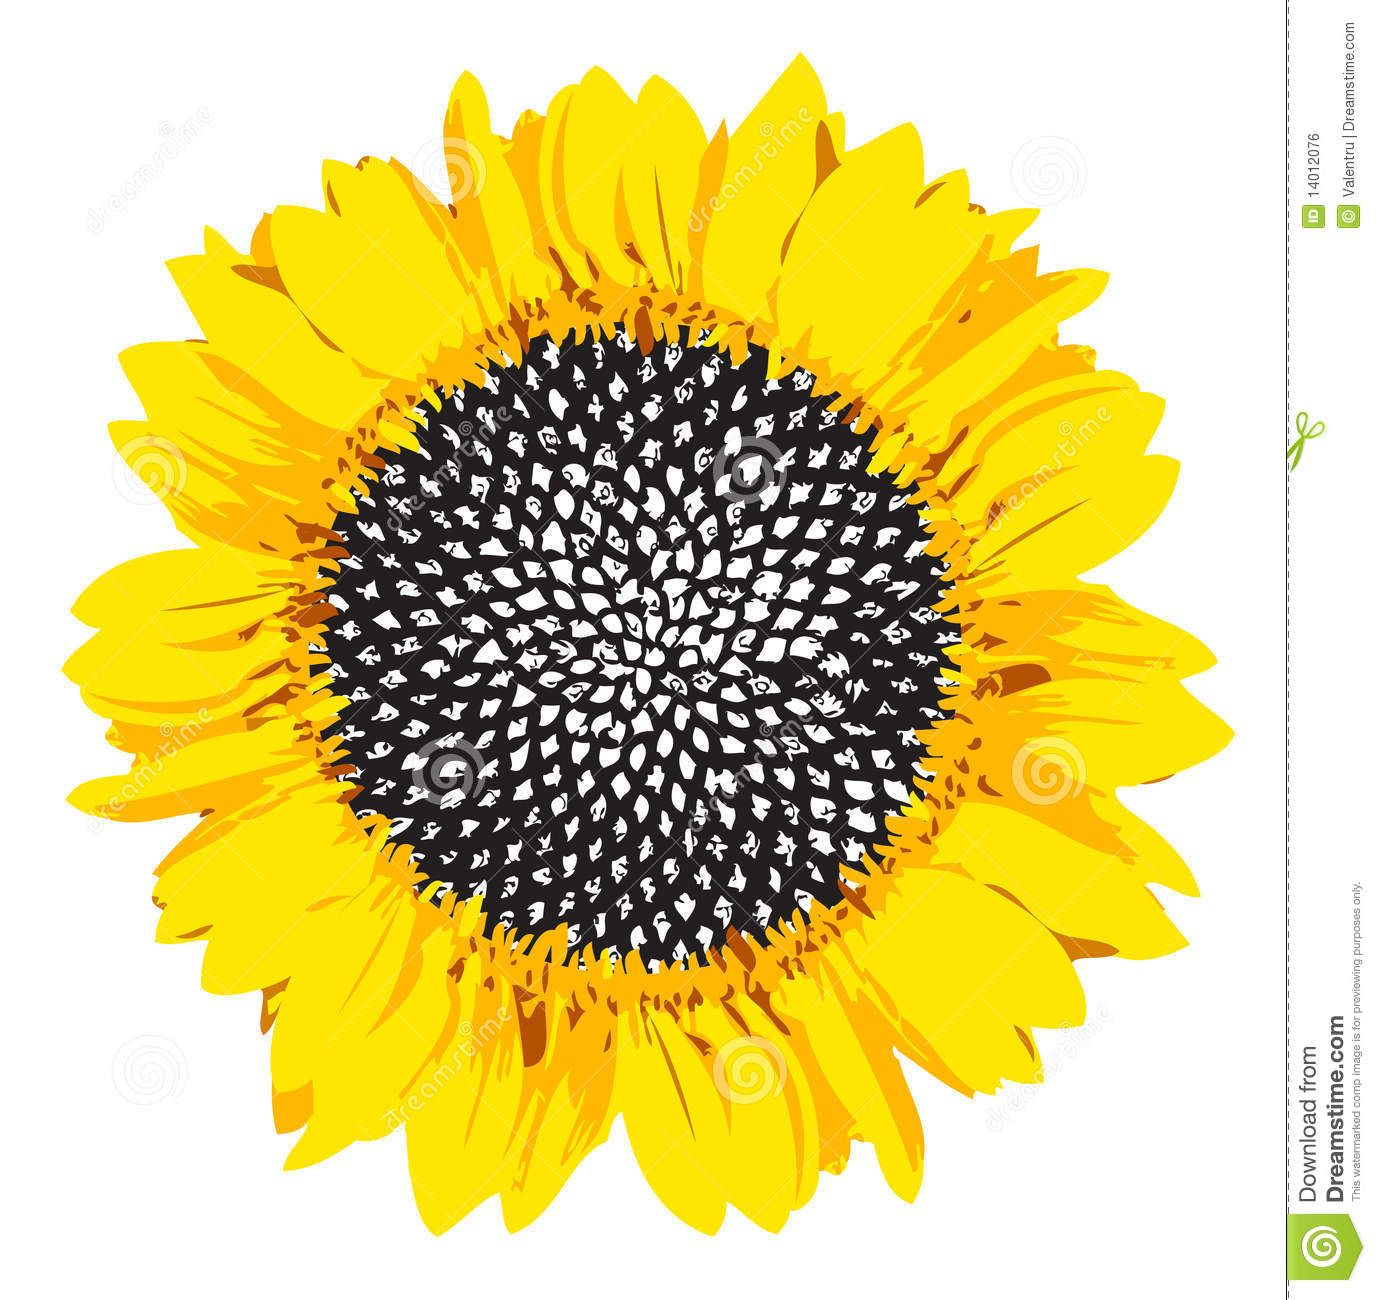 Sunflower Clip Art Black And White Yellow Sunflower.